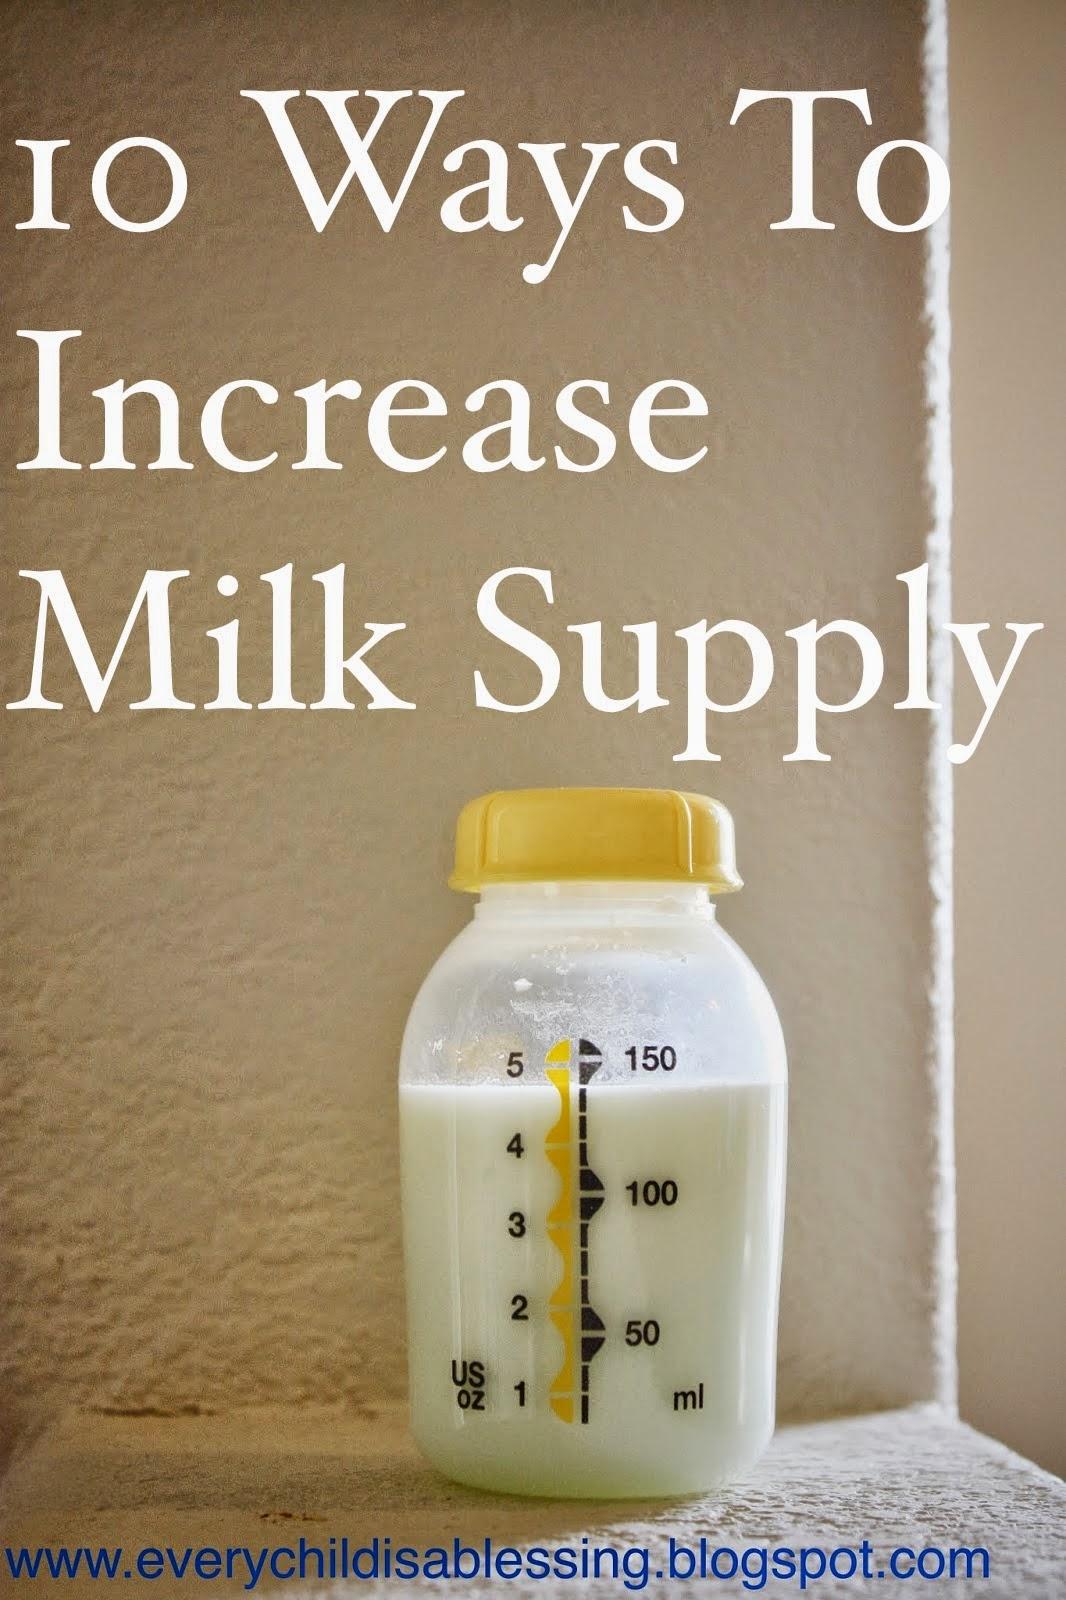 Diet increase breast milk topic, interesting